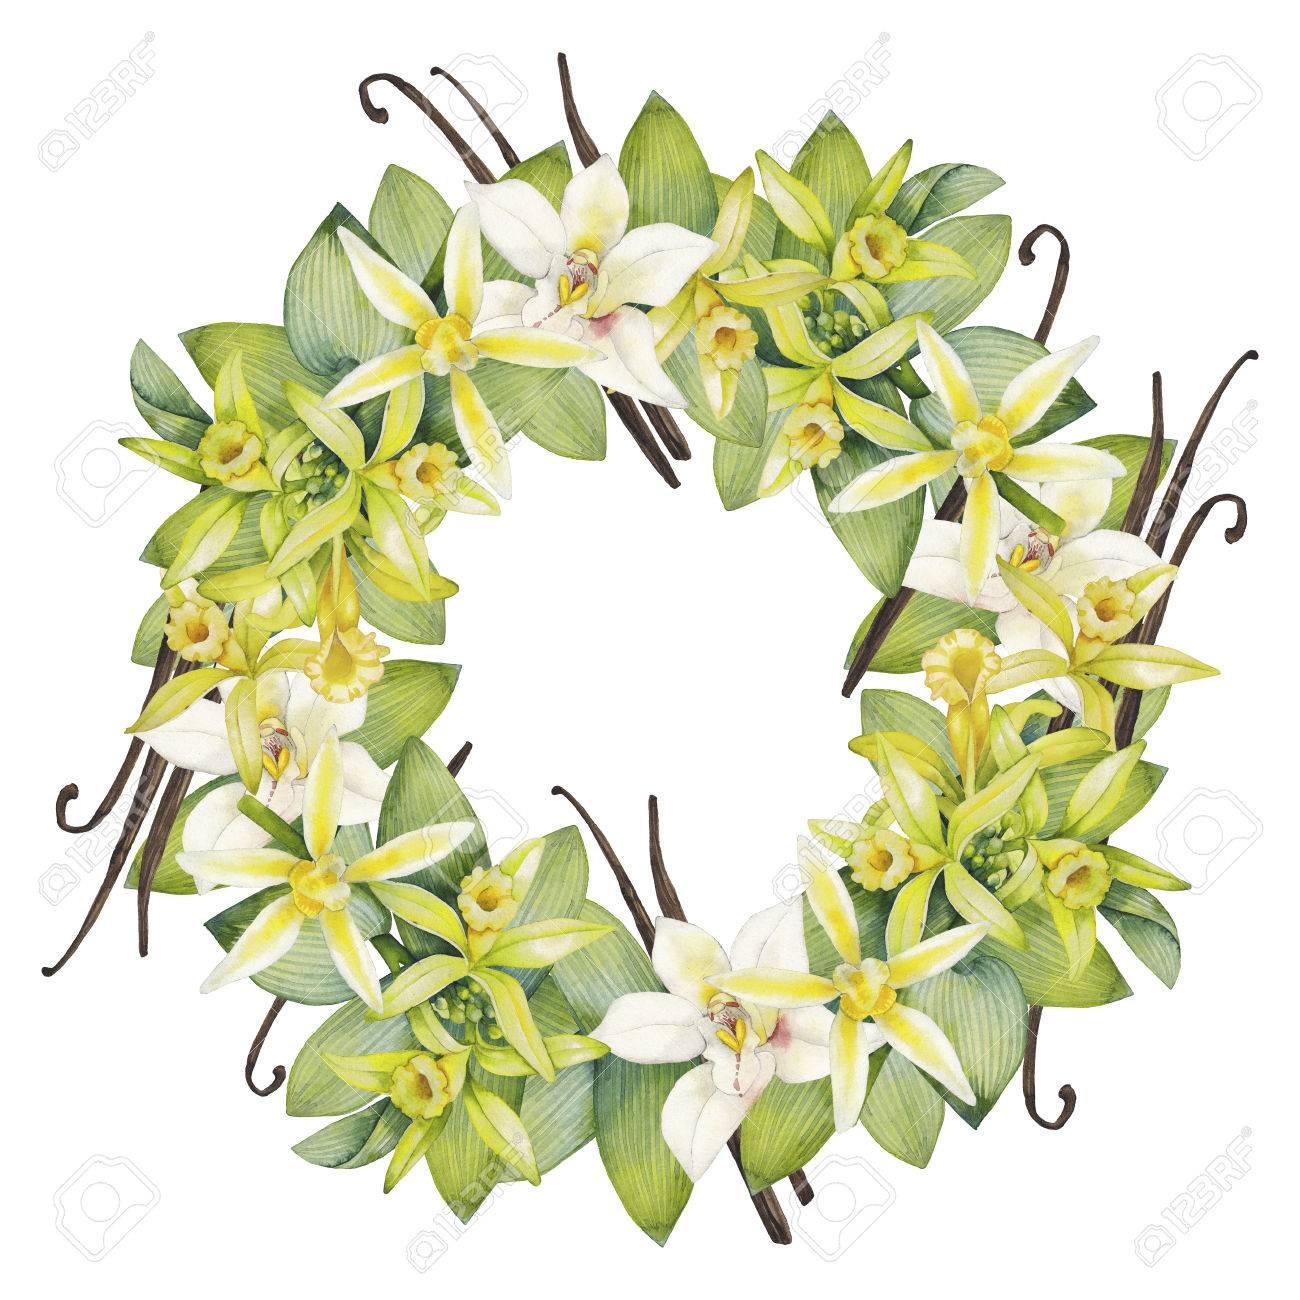 Watercolor vanilla wreath. Hand painted floral design - 58553695